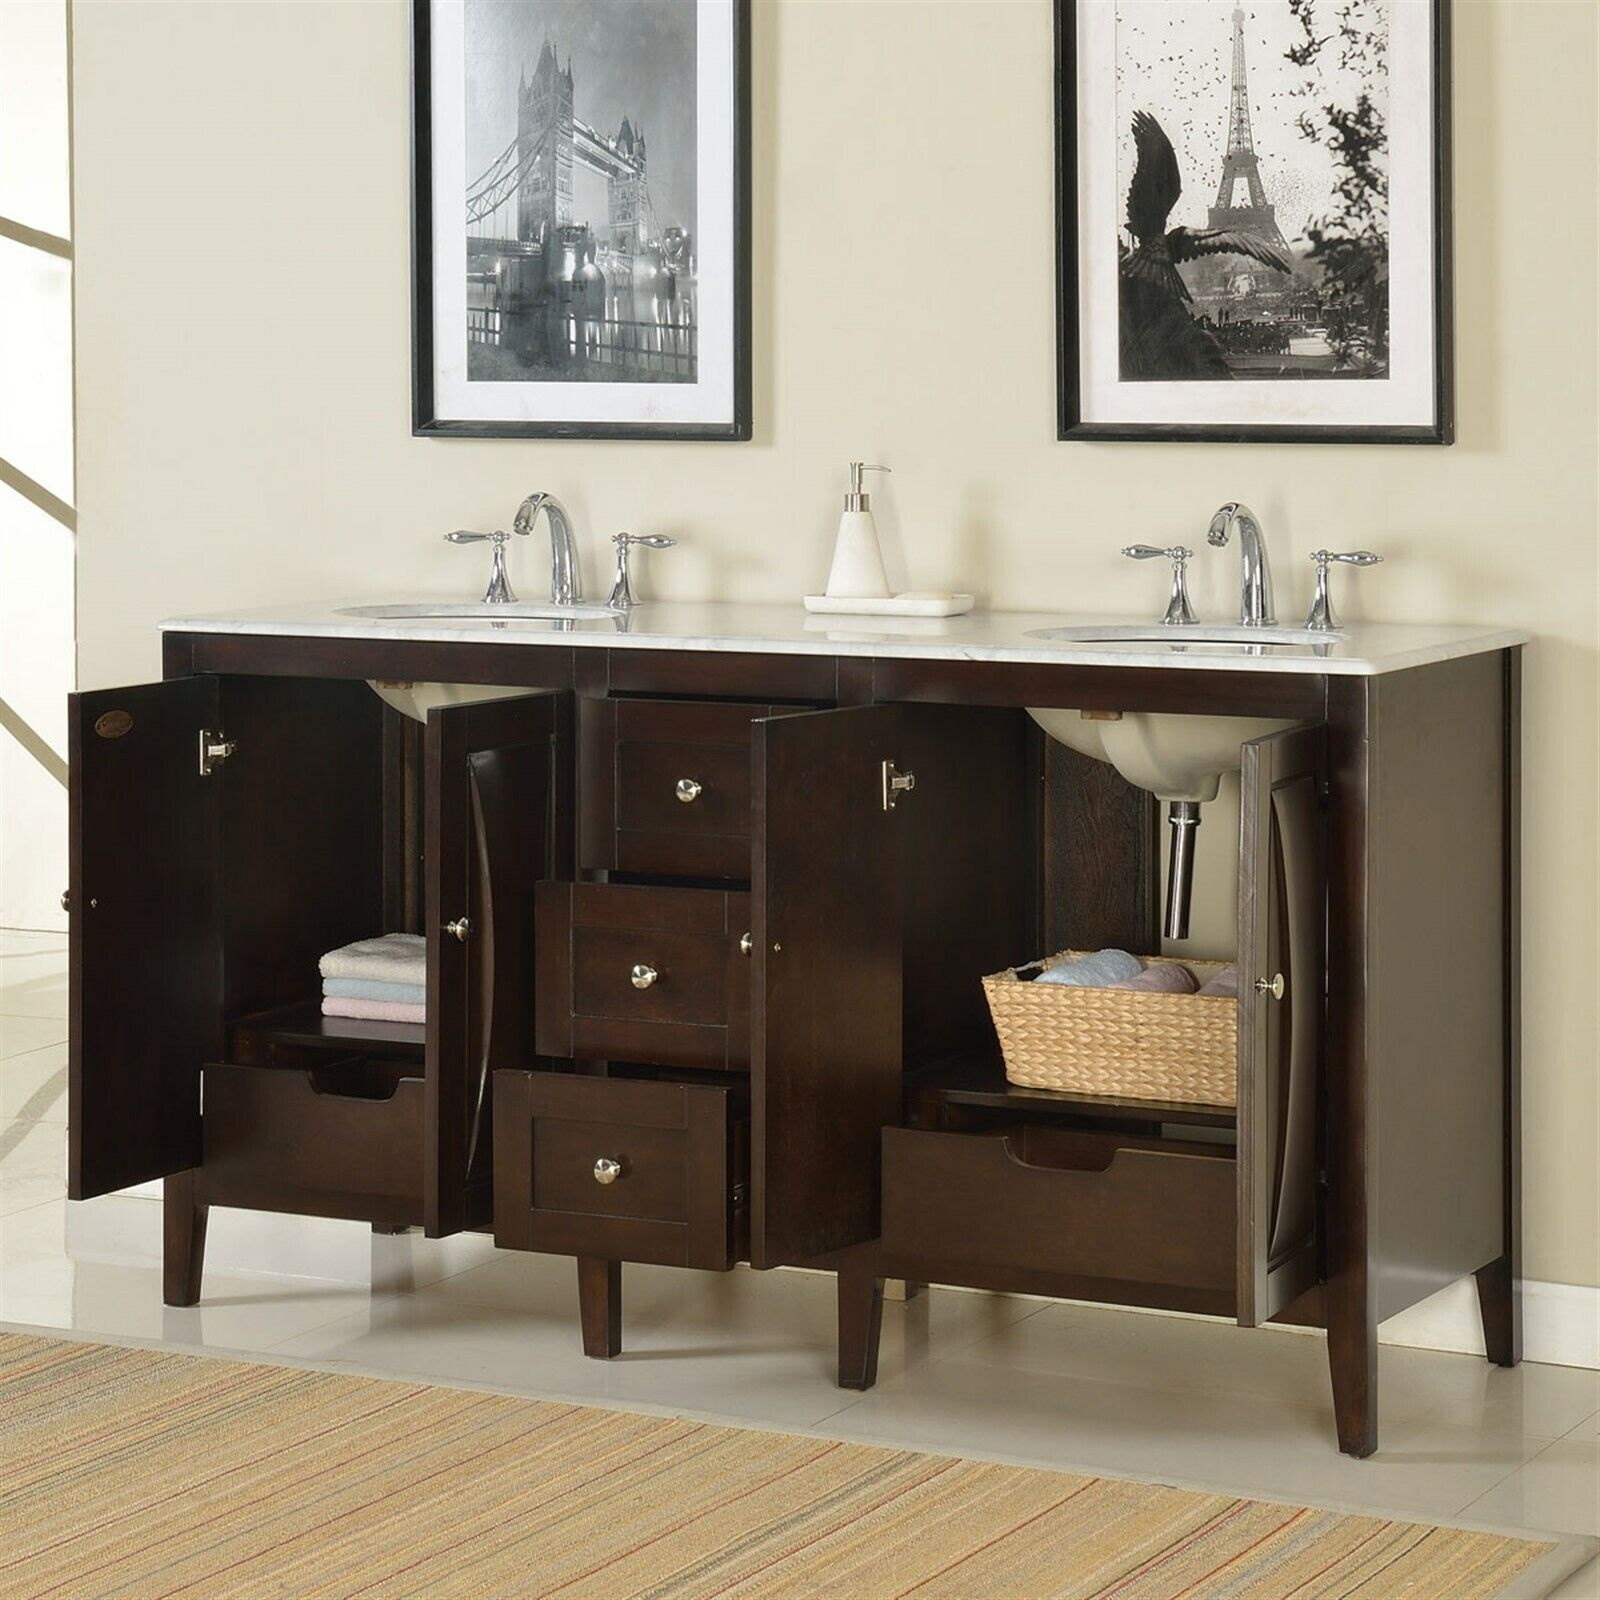 68 Inch Marble Stone Counter Top Bathroom Vanity Double Sink Cabinet 0269w 609224900815 Ebay